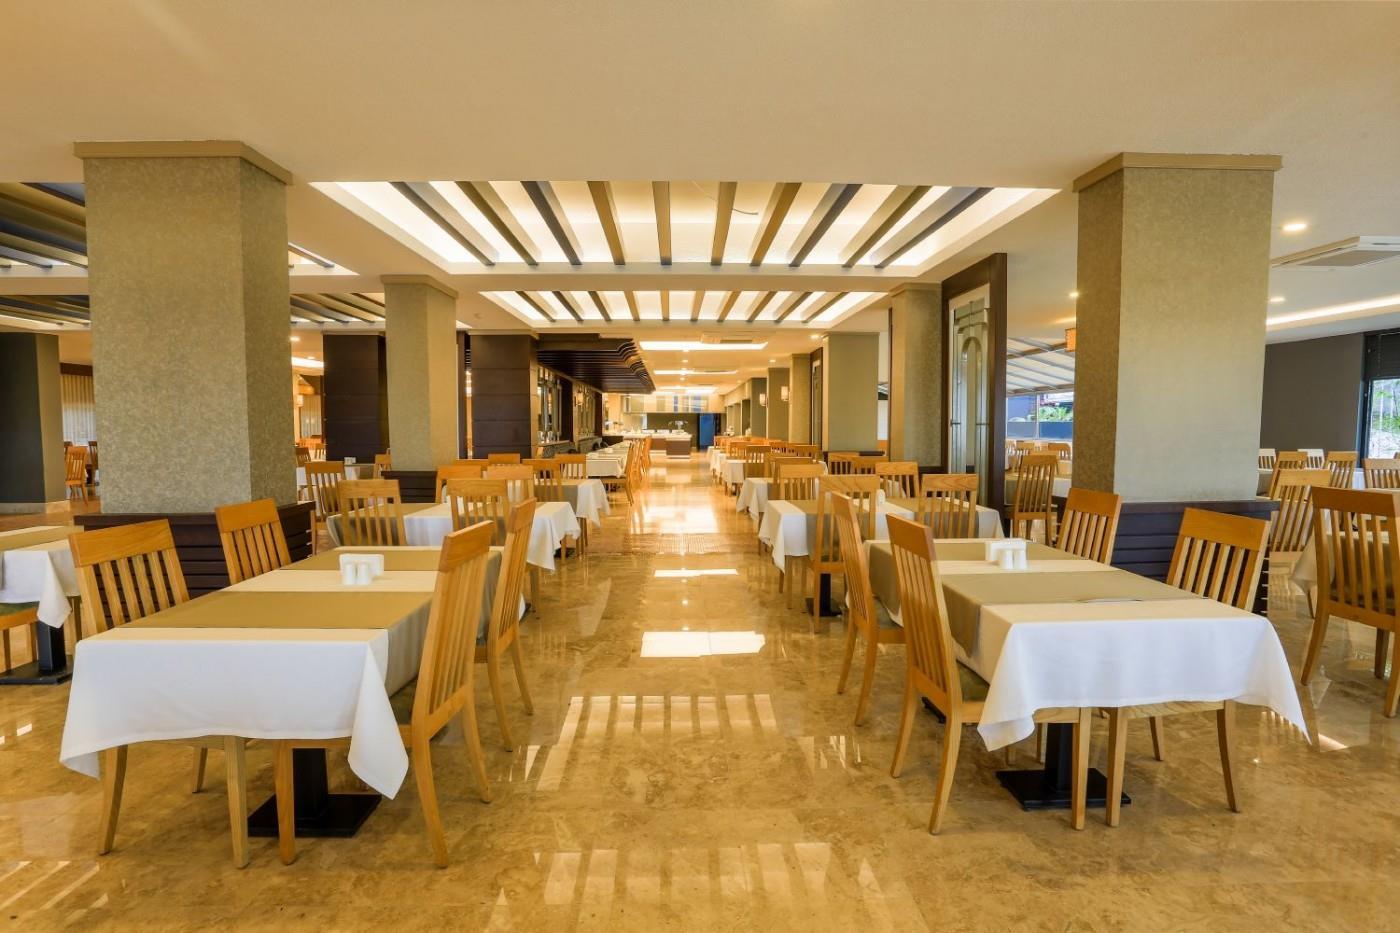 http://www.orextravel.sk/OREX/hotelphotos/thalia-unique-area-0033.jpg